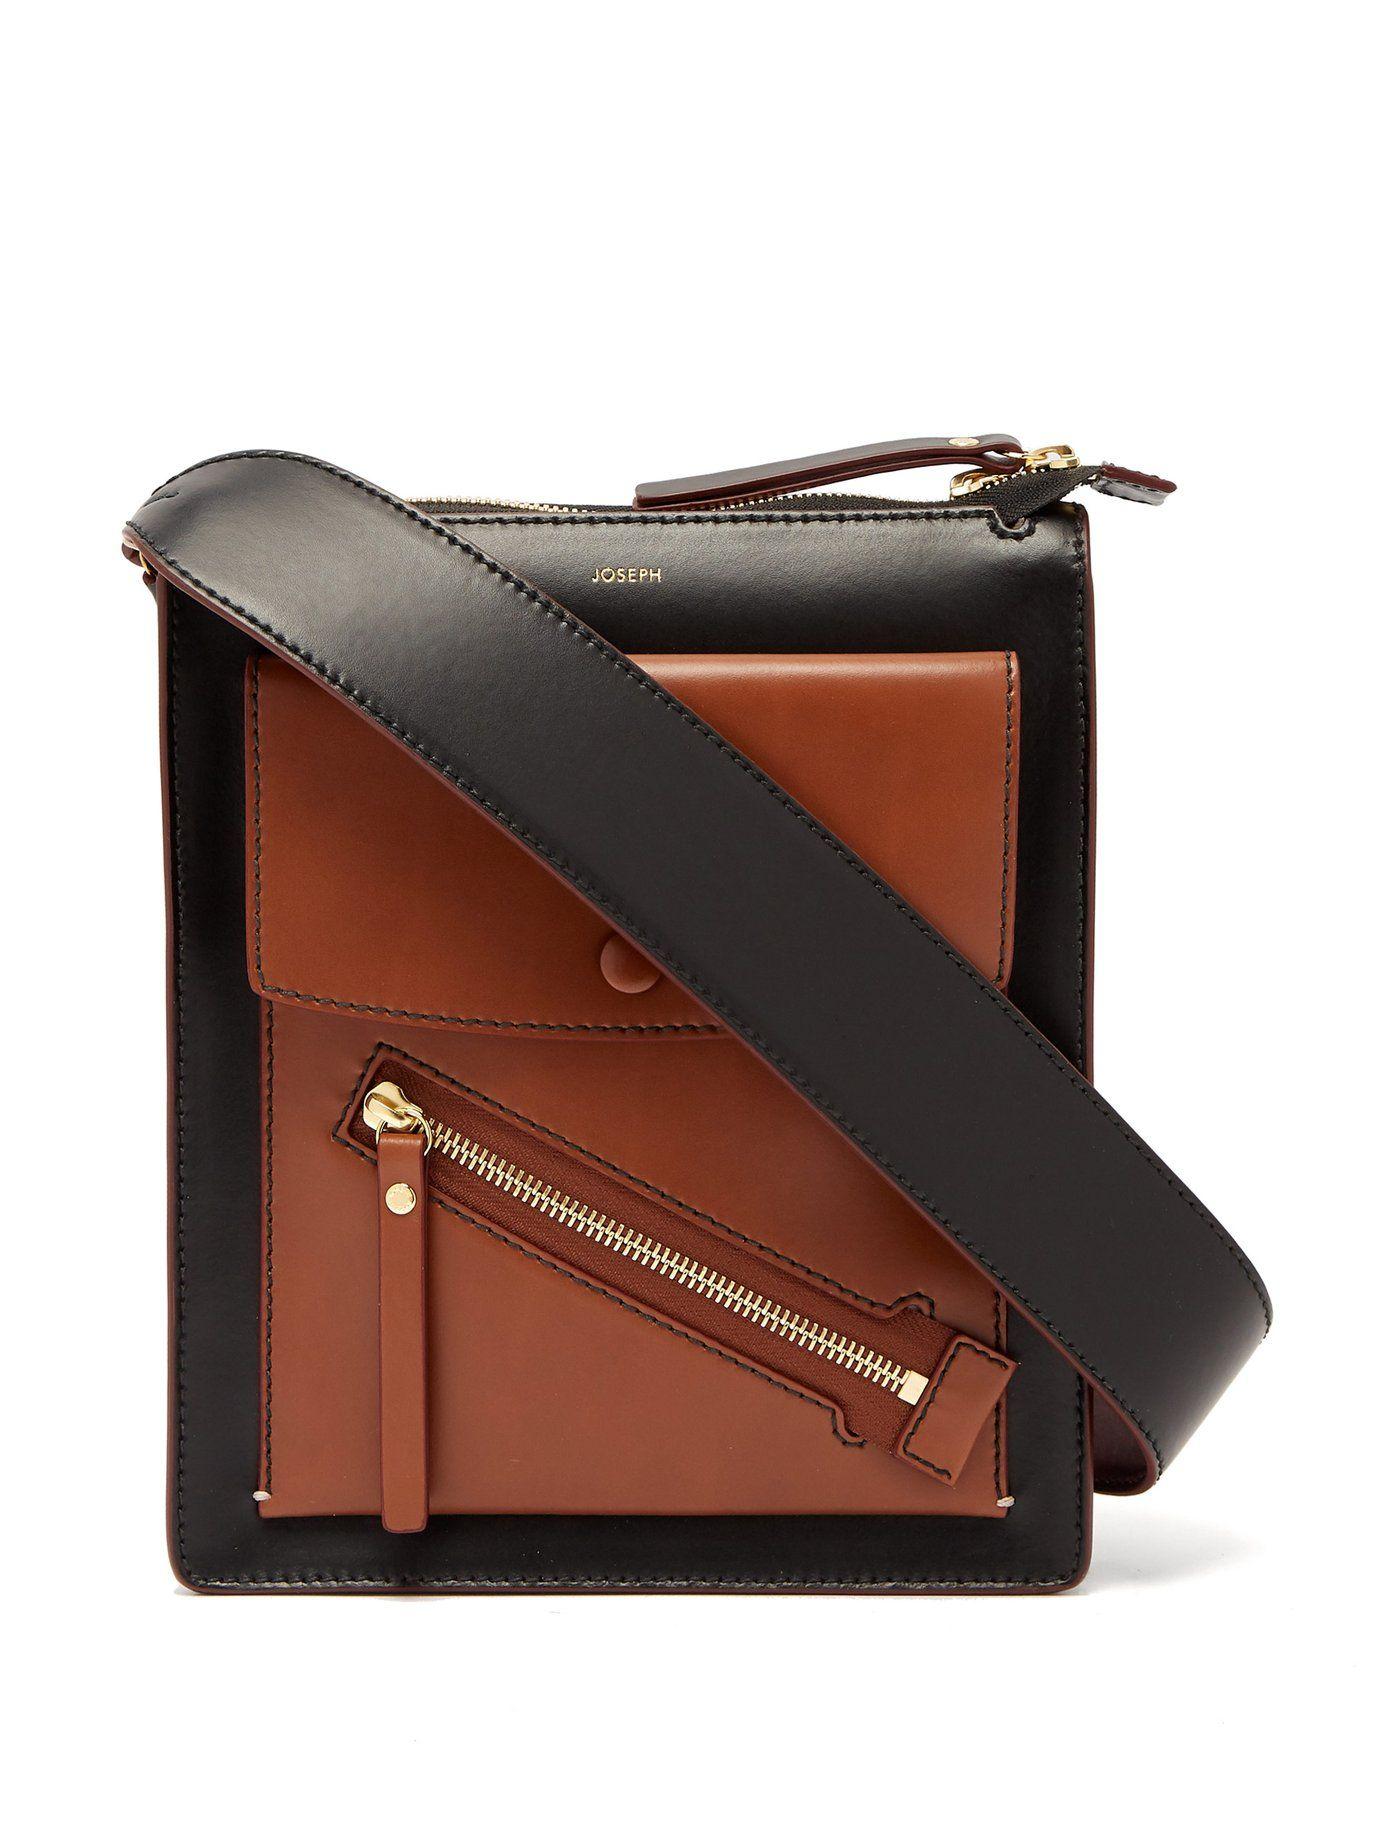 1ca8fd47cf7 Mortimer leather shoulder bag   Joseph   MATCHESFASHION.COM ...